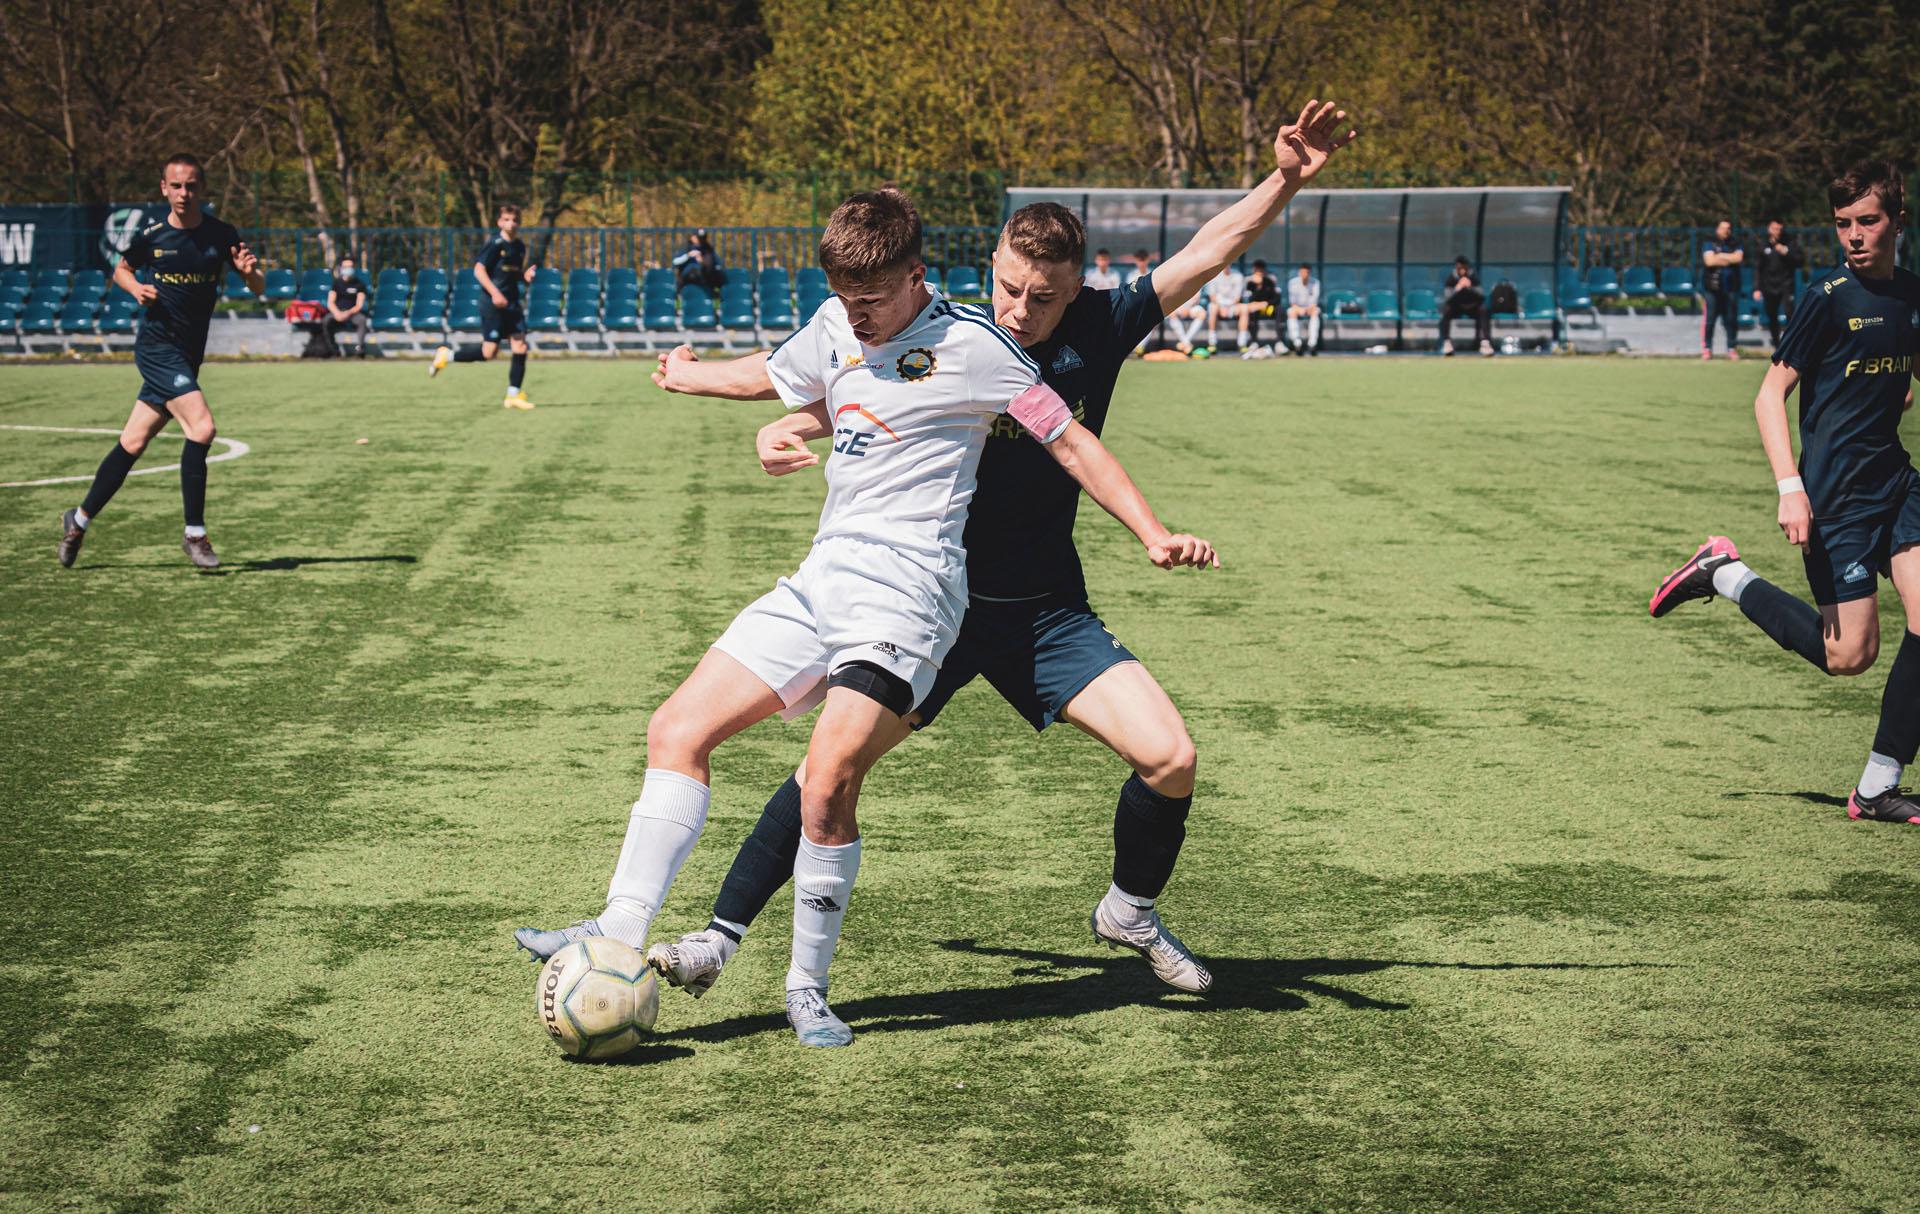 Stal Rzeszów U16 - FKS Stal Mielec 09-05-2021, fot. K.Krupa